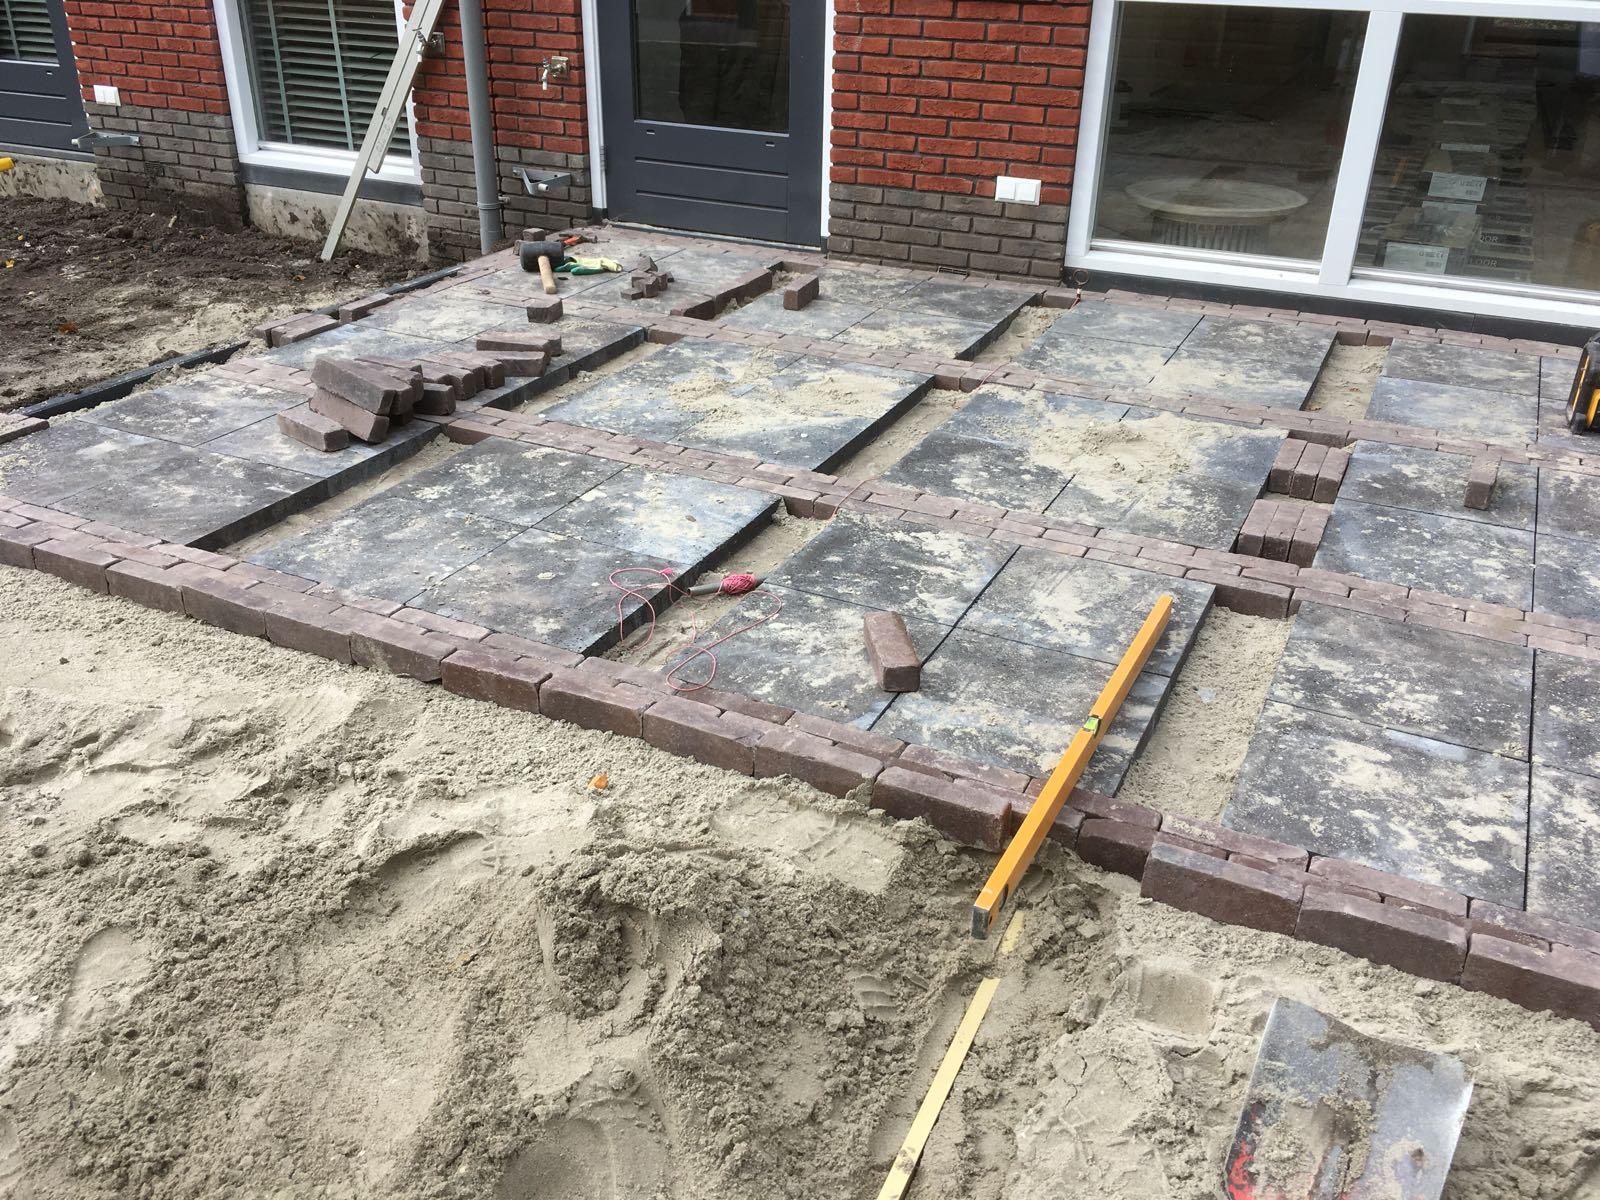 Beknopte achtertuin in Nootdorp - Nederhof Hoveniers